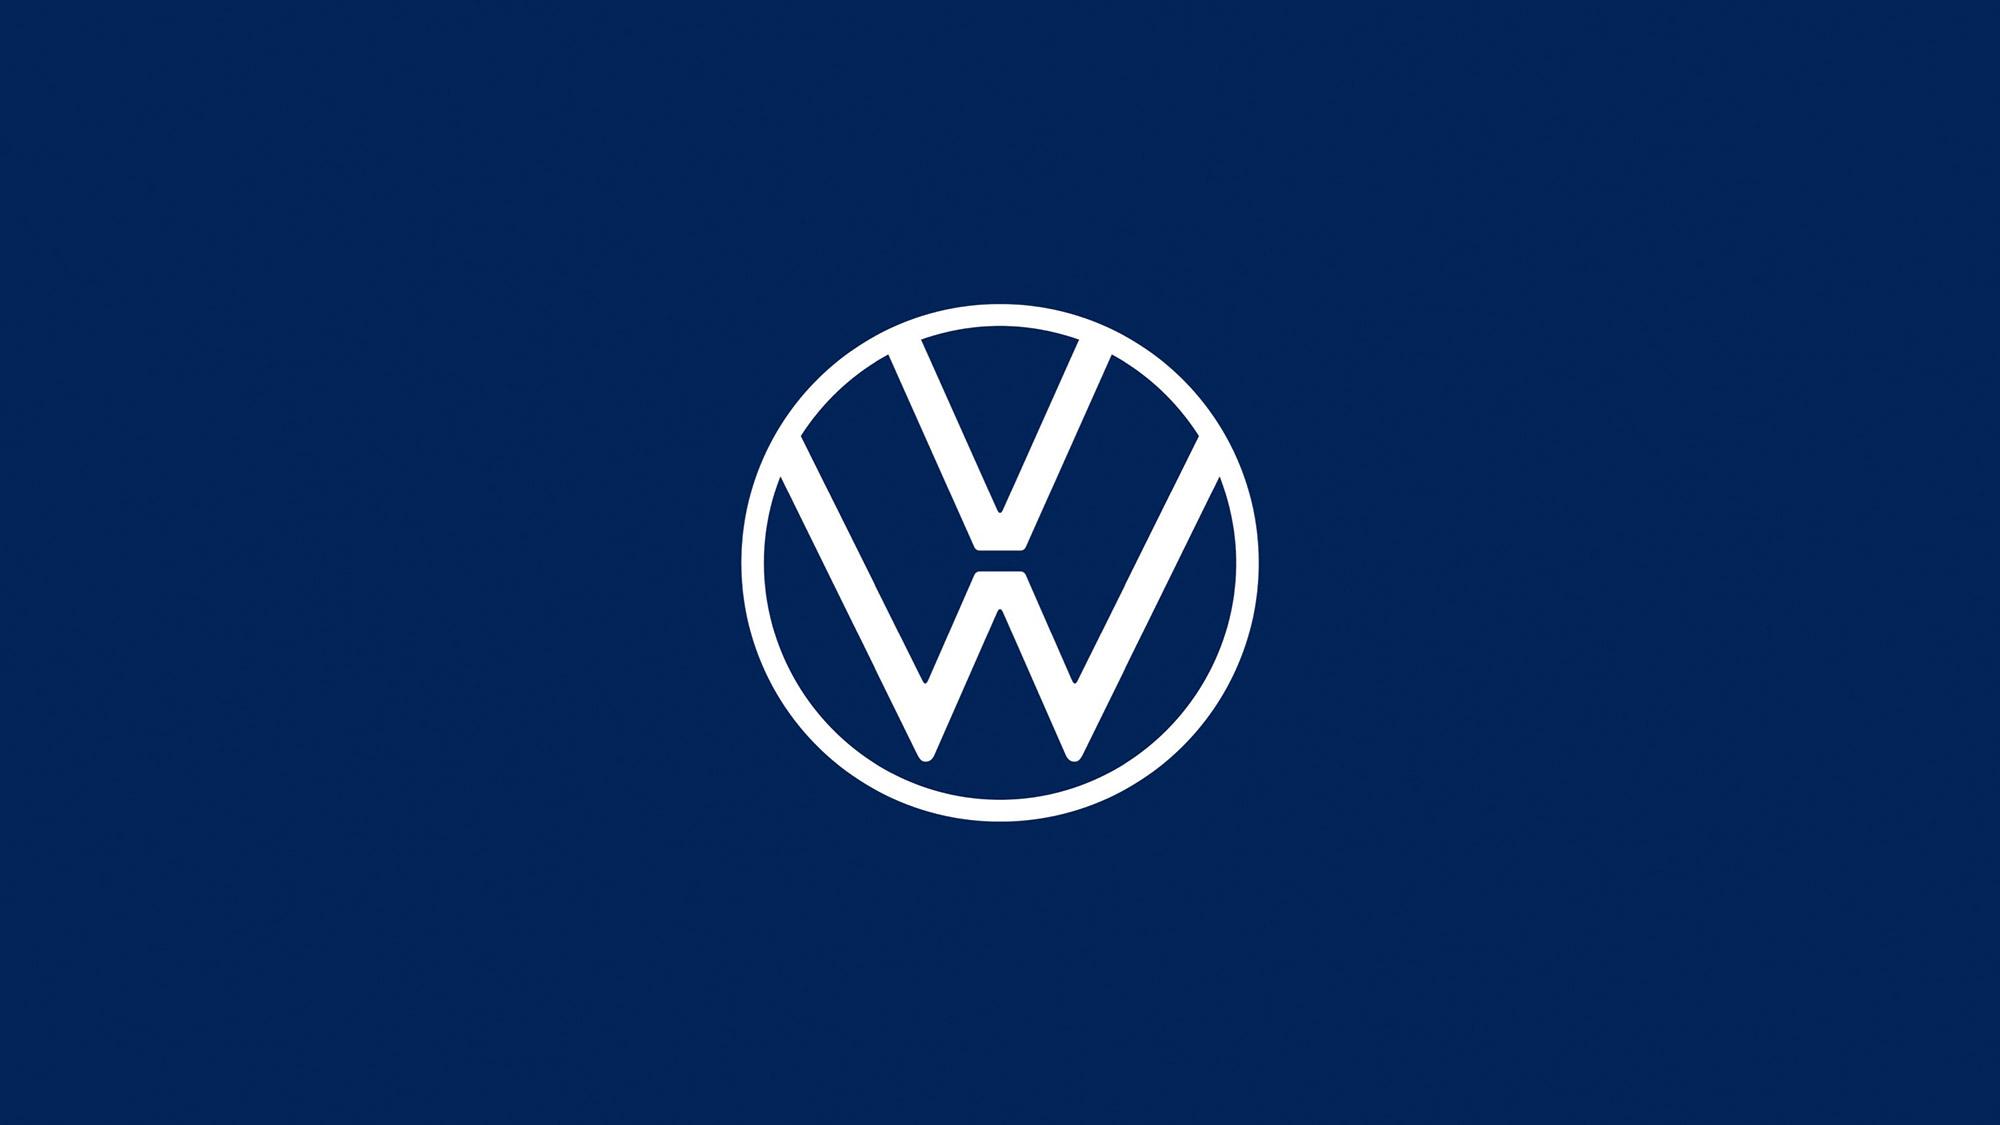 volkswogen-yeni-logo-002.jpg